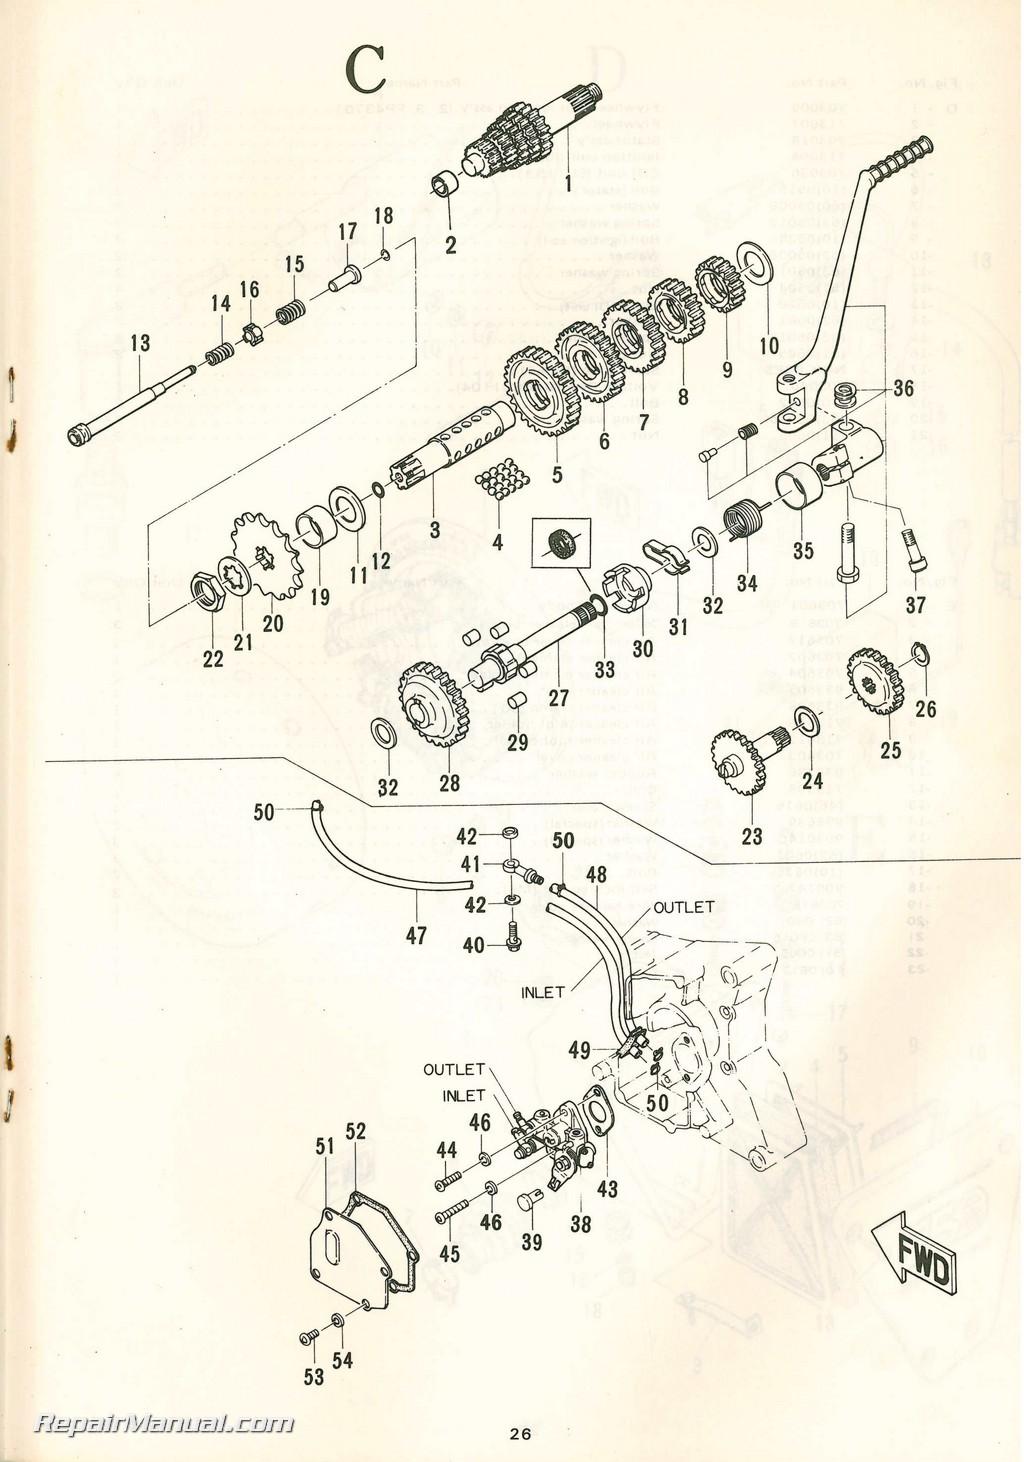 Diagram besides Fog as well Maxresdefault further B F Cb further R Wiring. on honda wiring diagram